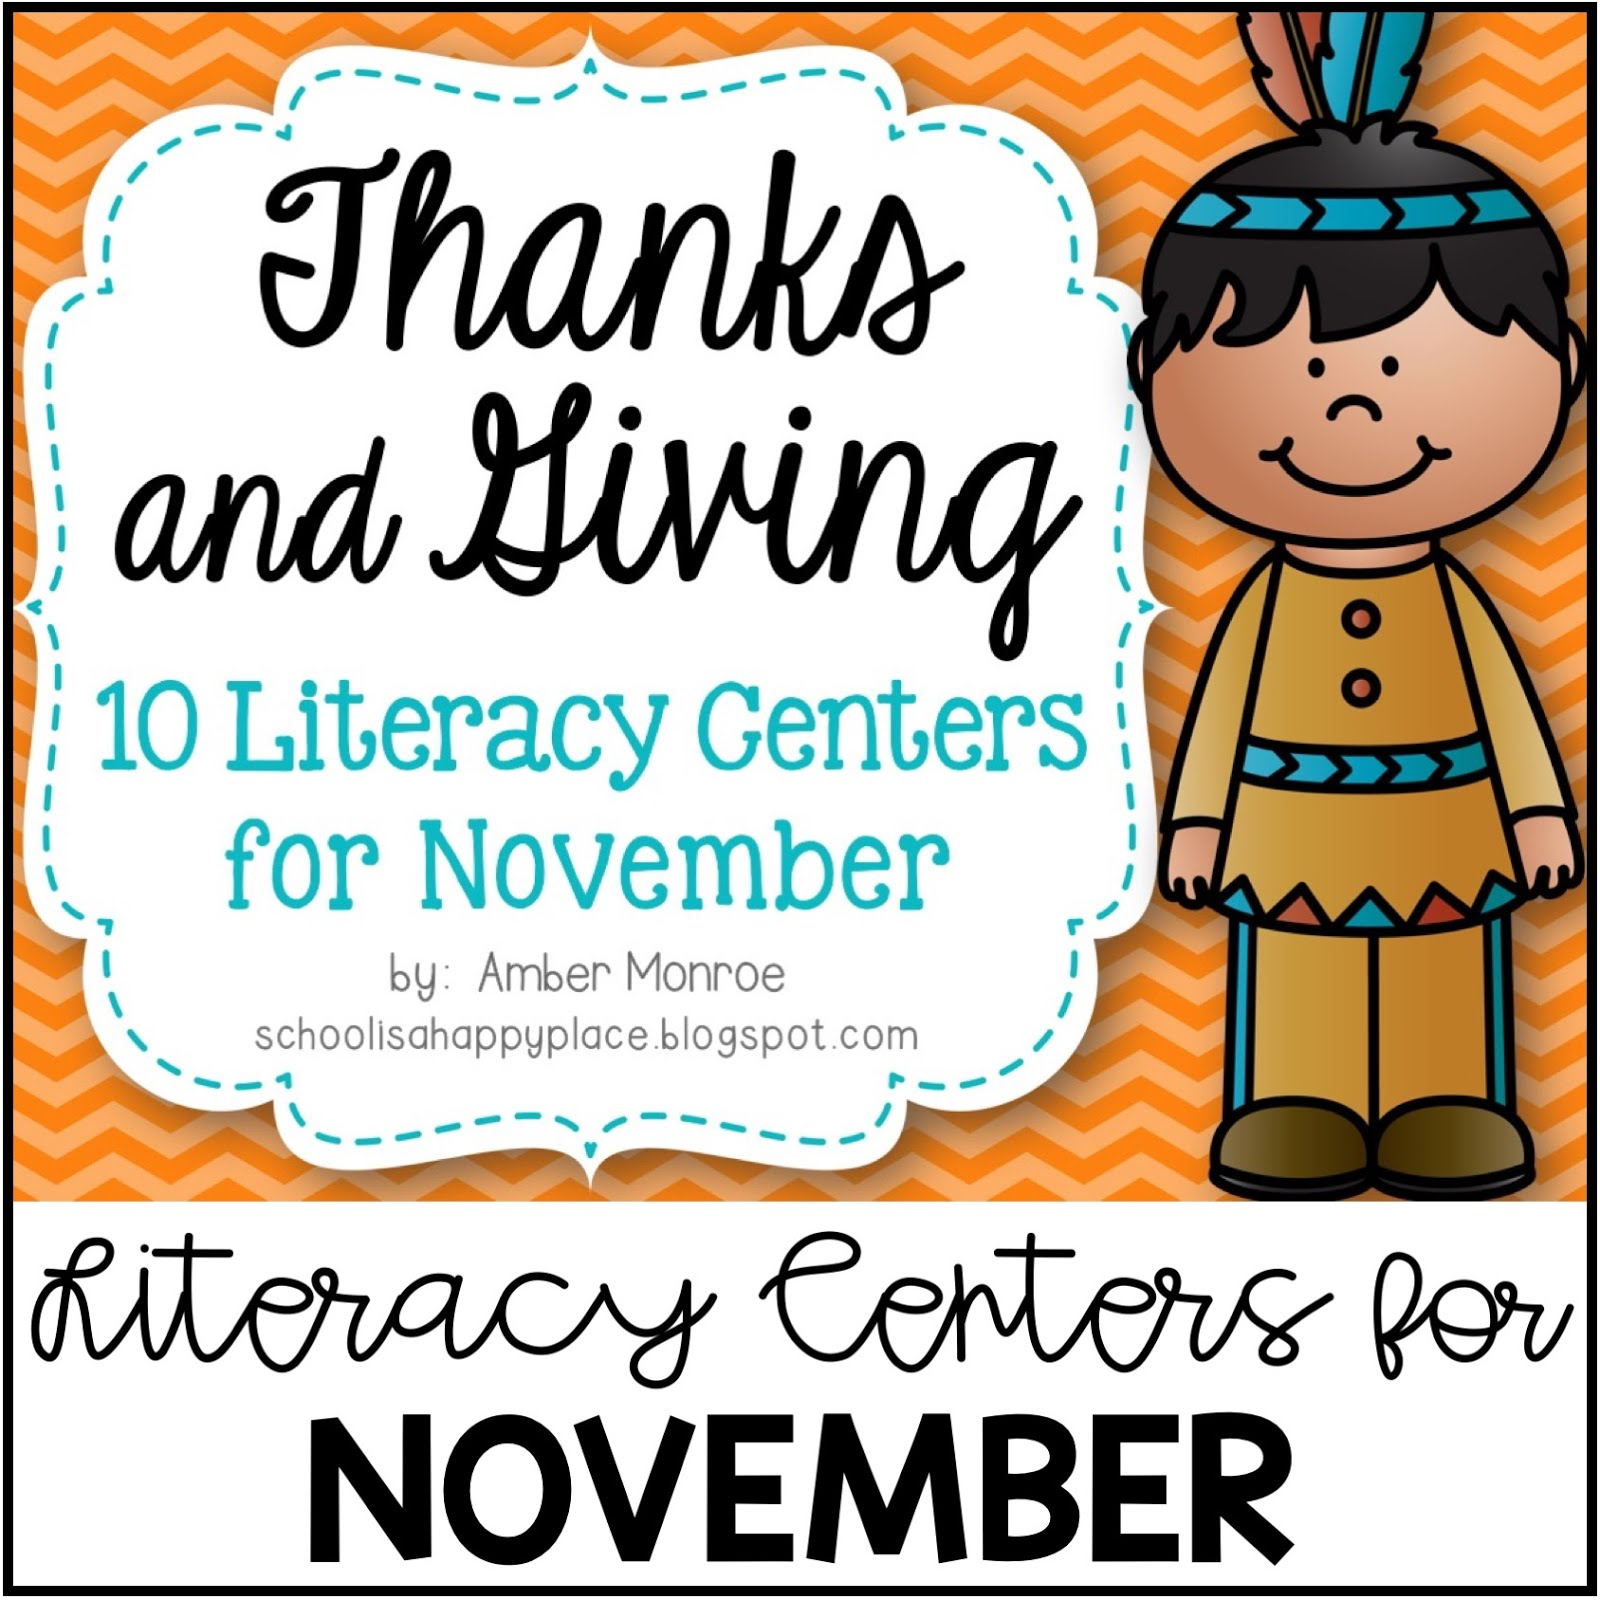 Literacy Centers for November